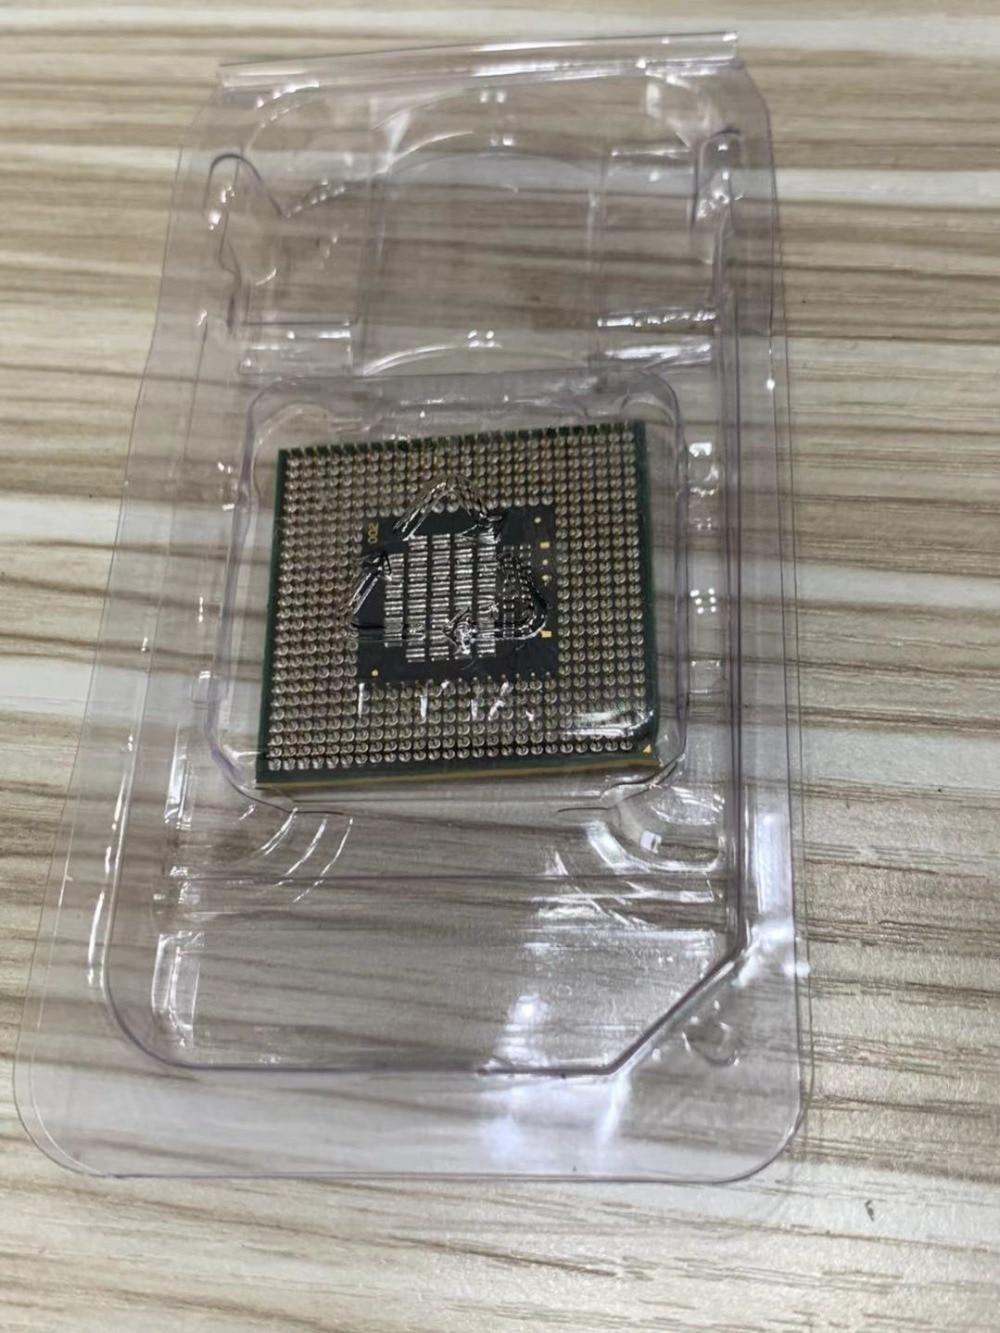 T7300 CPU 4M Socket 479 Cache/2.0GHz/800/Dual-Core processor support 965 t7300 cpu 4m socket 479 cache 2 0ghz 800 dual core processor support 965